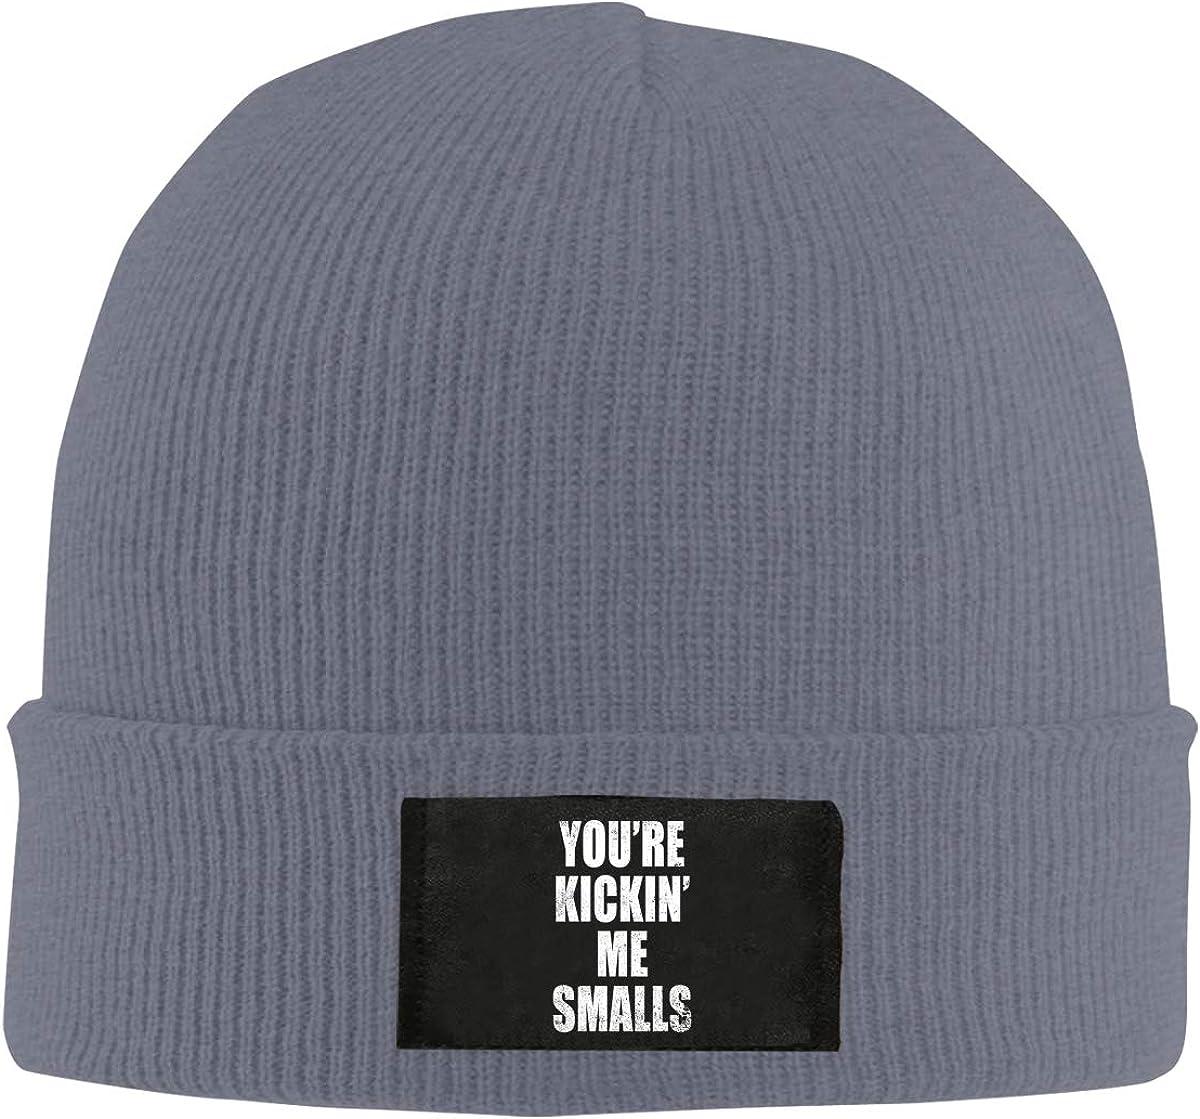 Kickin Me Smalls Top Level Beanie Men Women Unisex Stylish Slouch Beanie Hats Black